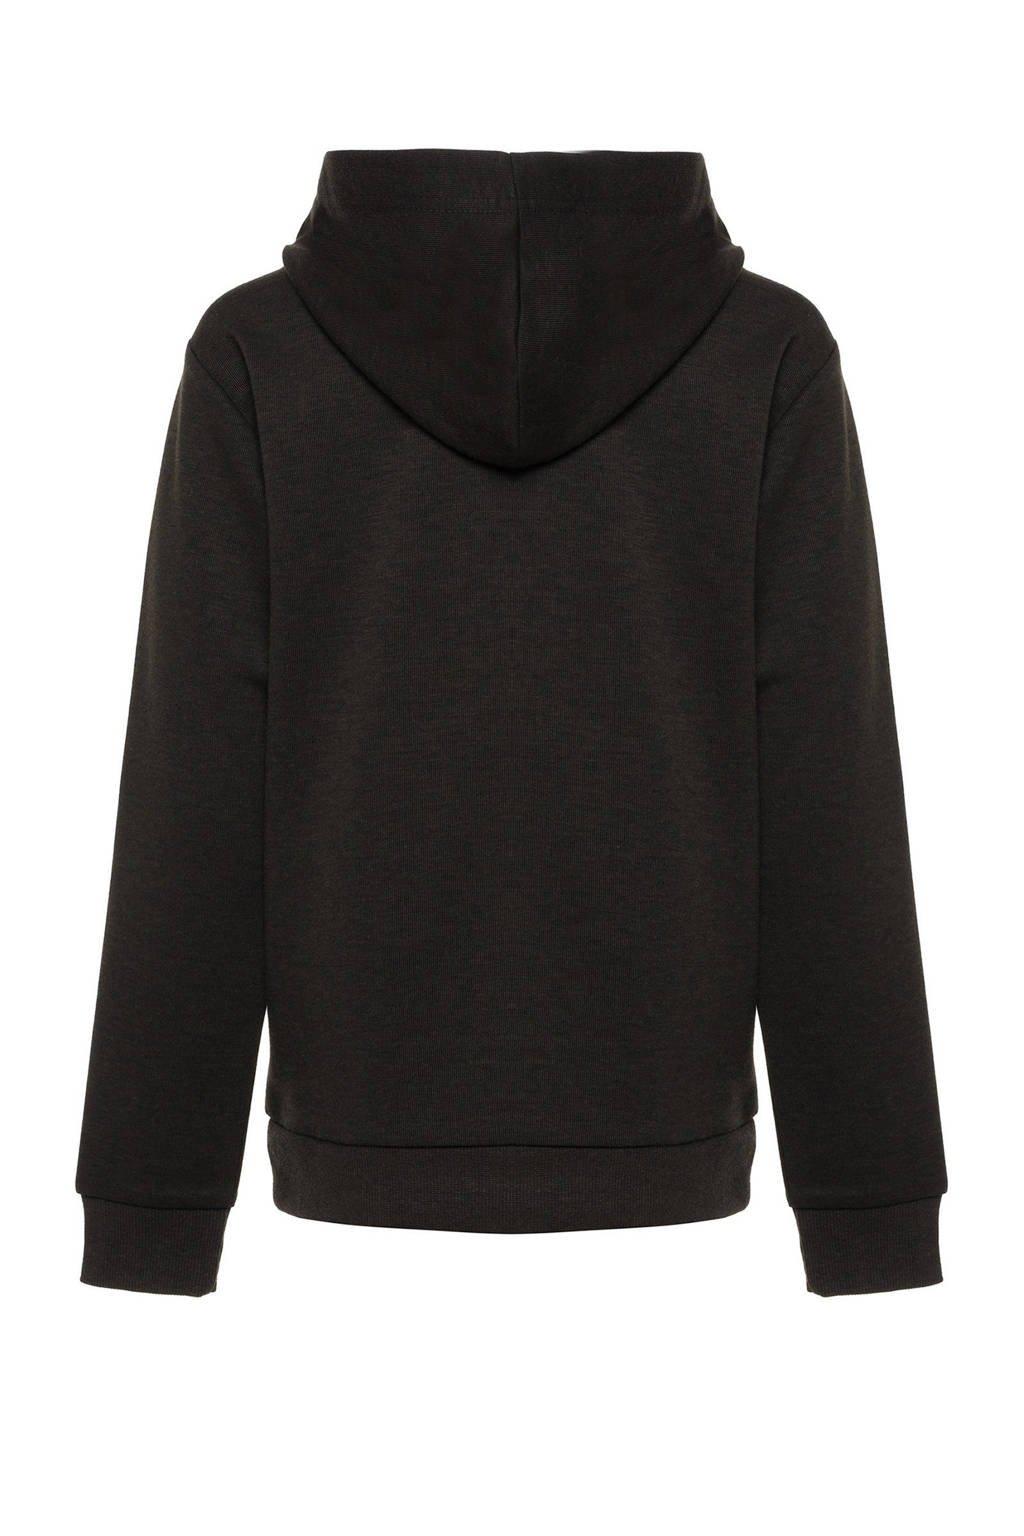 Scapino Osaga hoodie donkergroen, Donkergroen